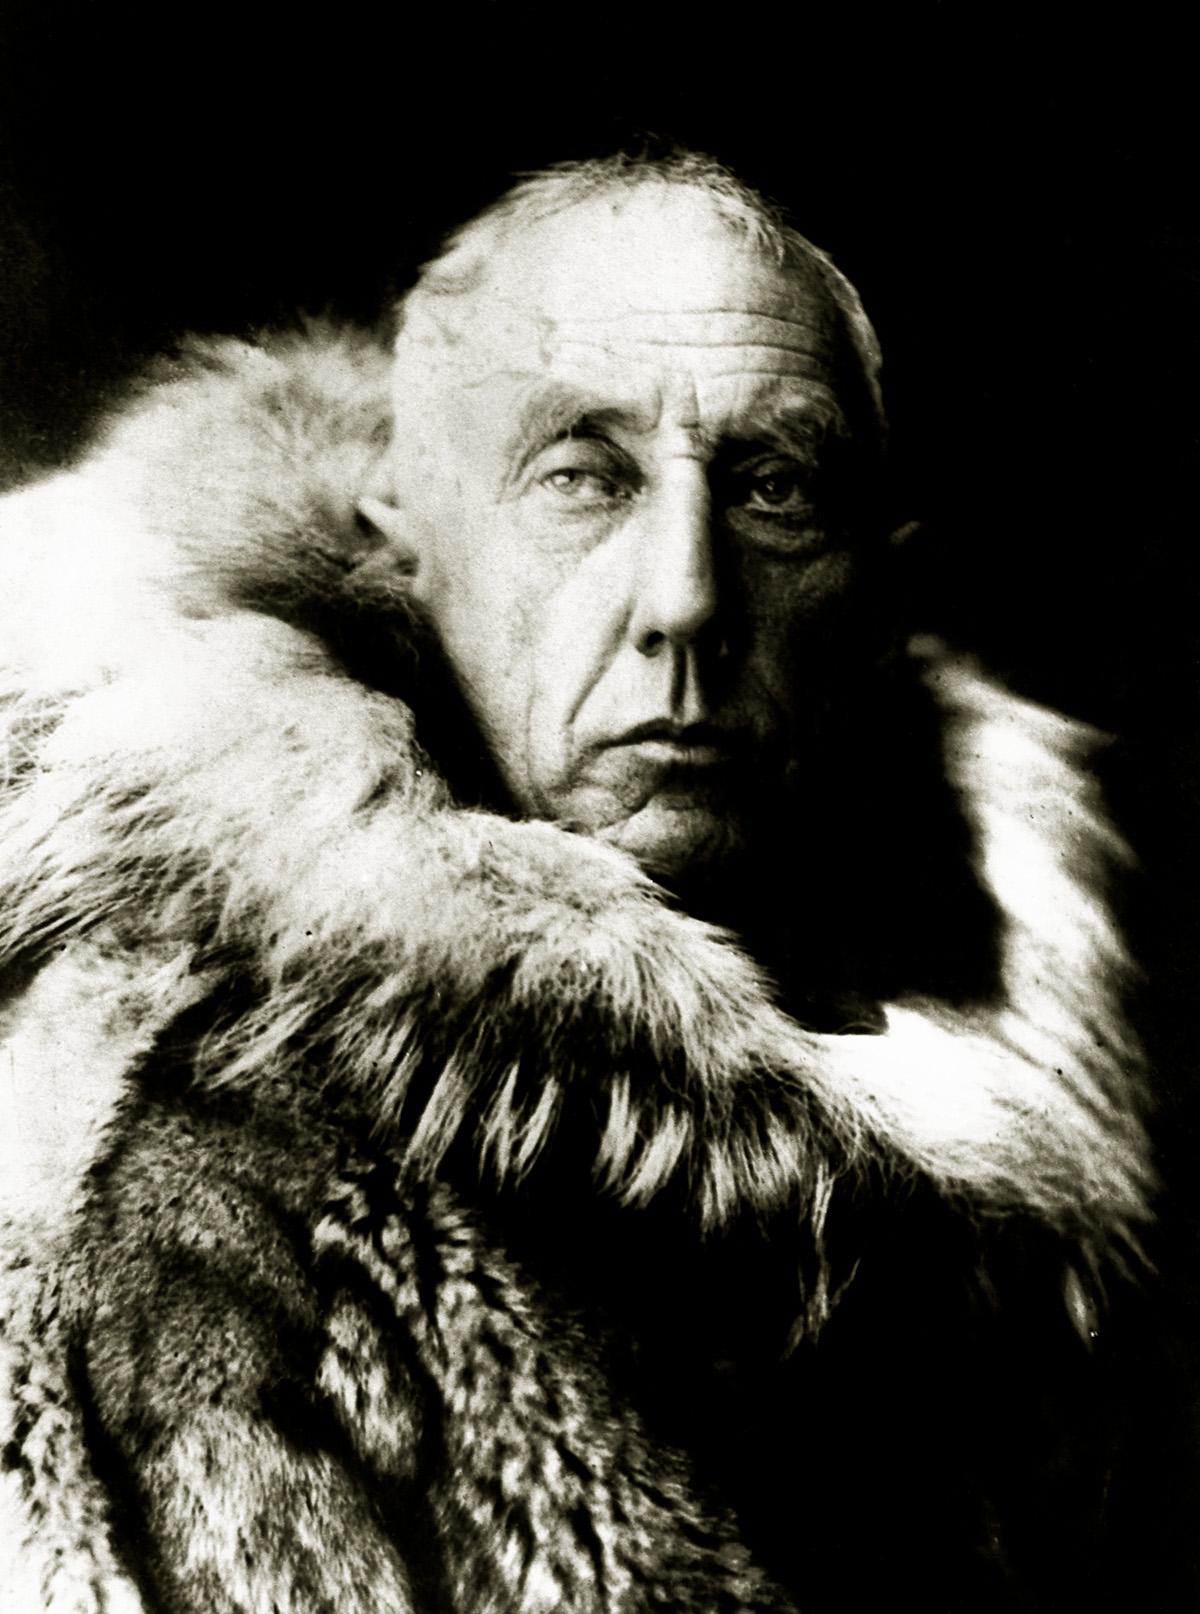 data-cke-saved-src=http://www.bilimgenc.tubitak.gov.tr/sites/default/files/amundsen2.jpg